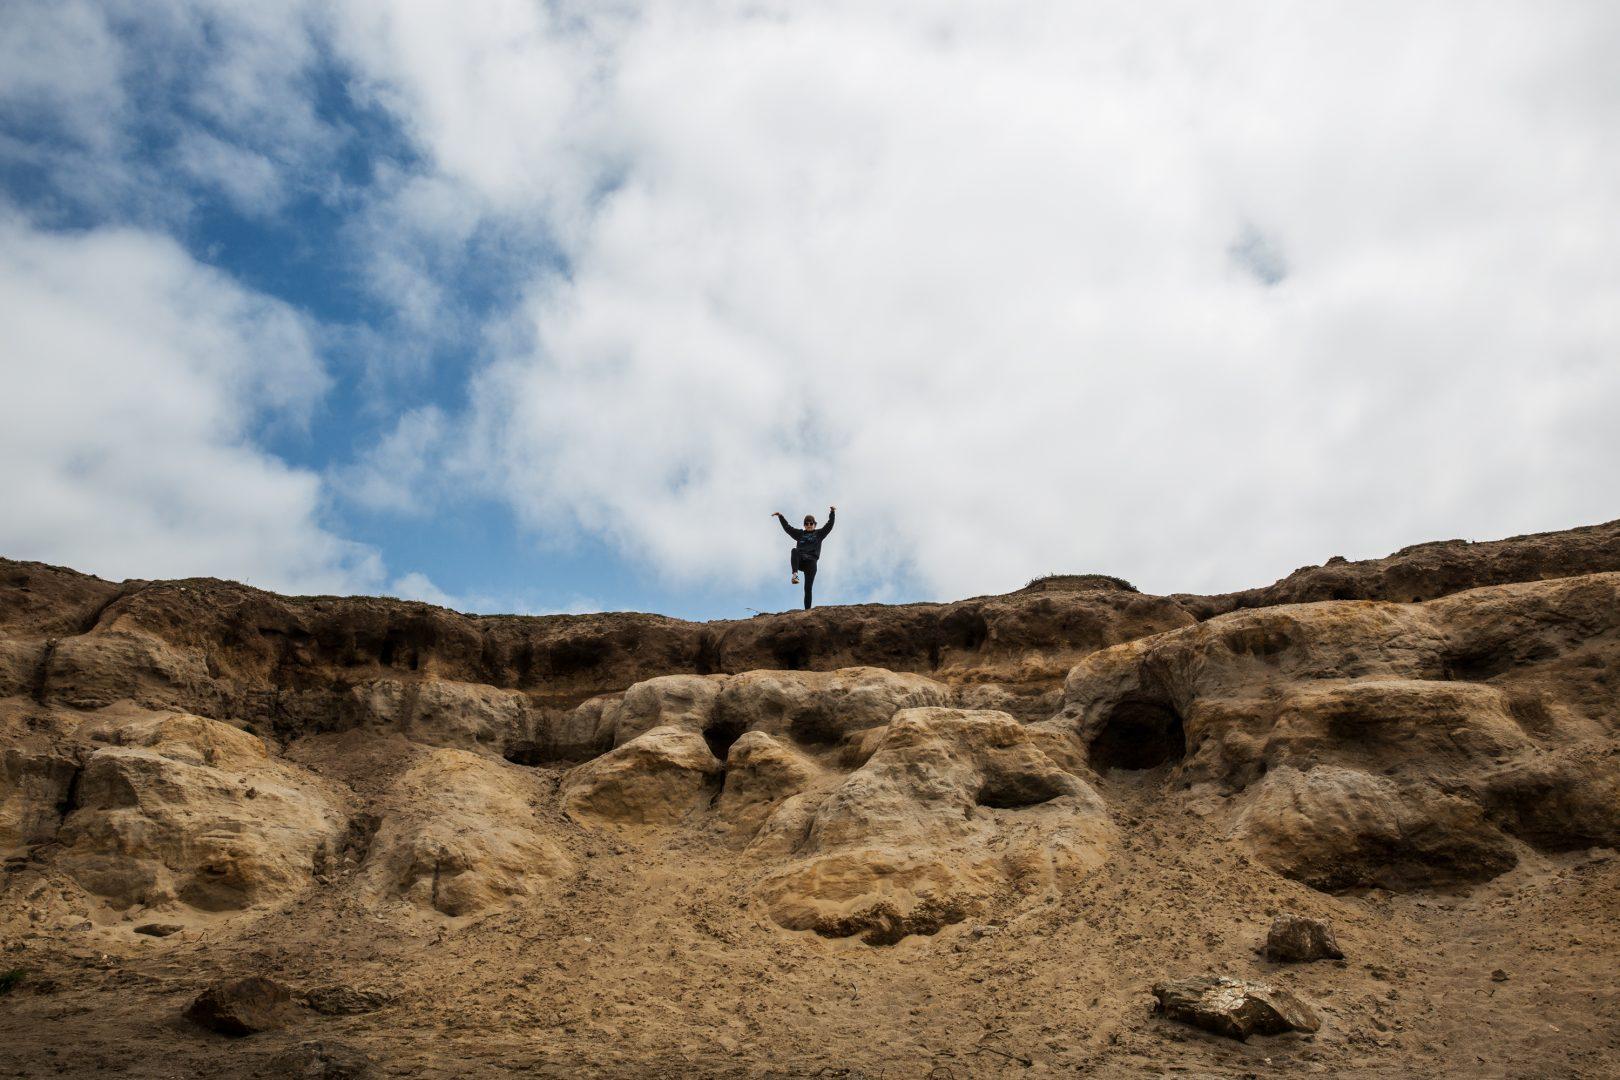 Karate Kid @ Glass Beach, Fort Bragg California